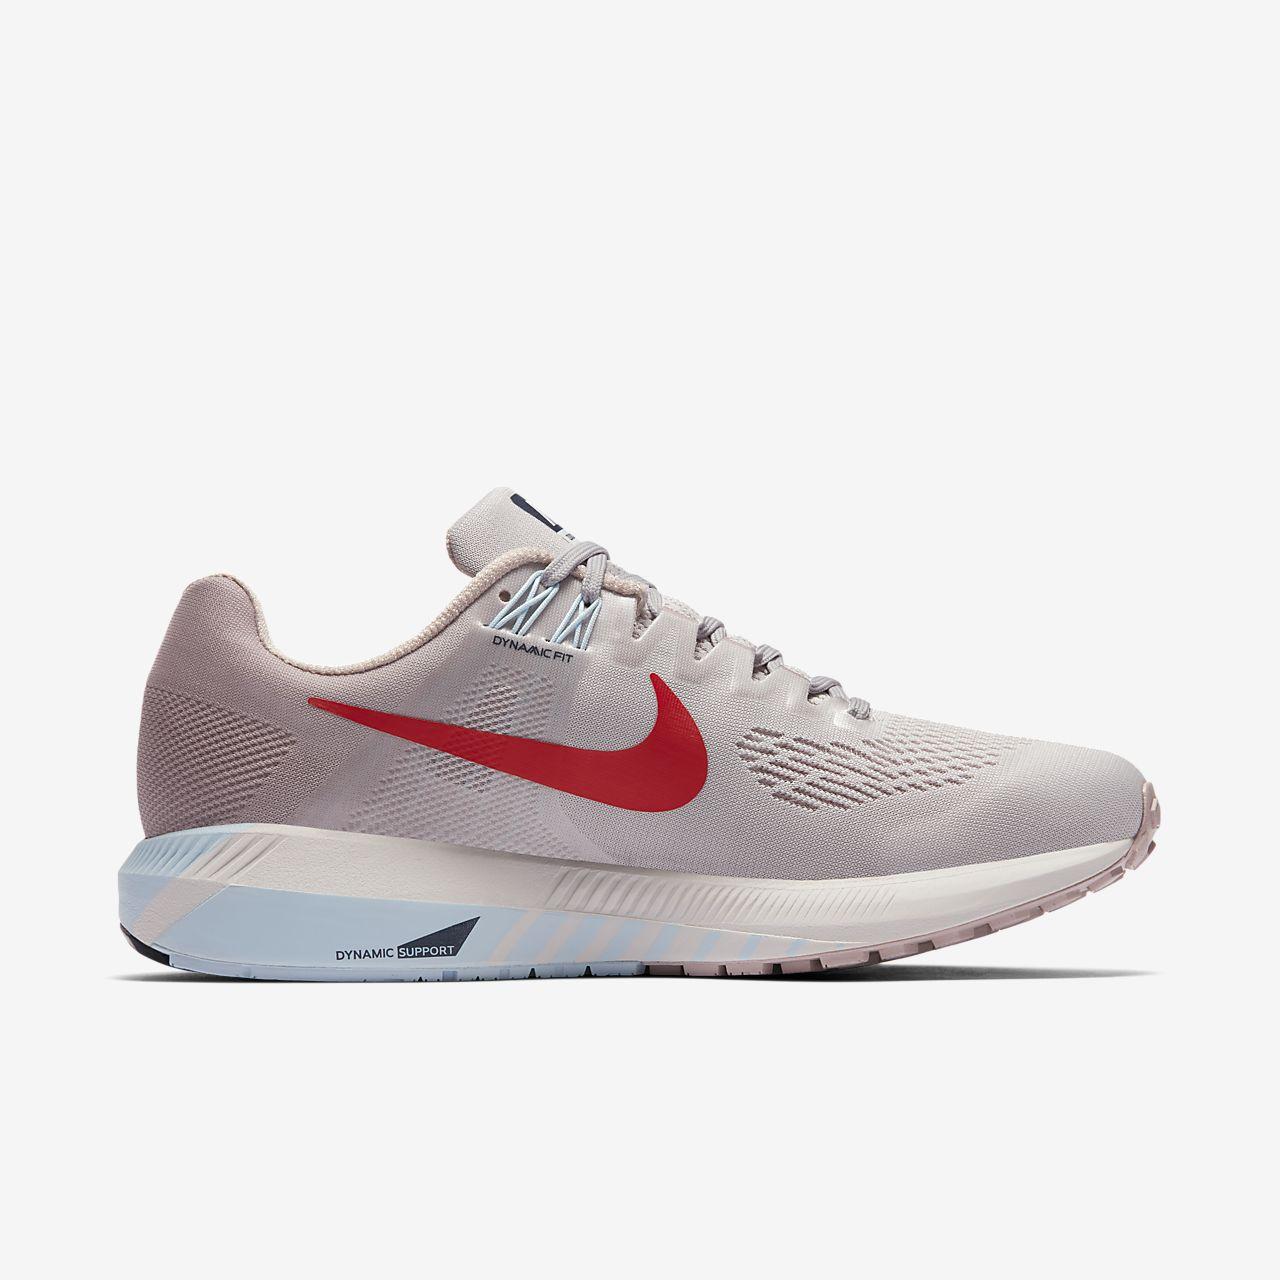 Nike AIR ZOOM STRUCTURE 21 Gris nxJkdI1